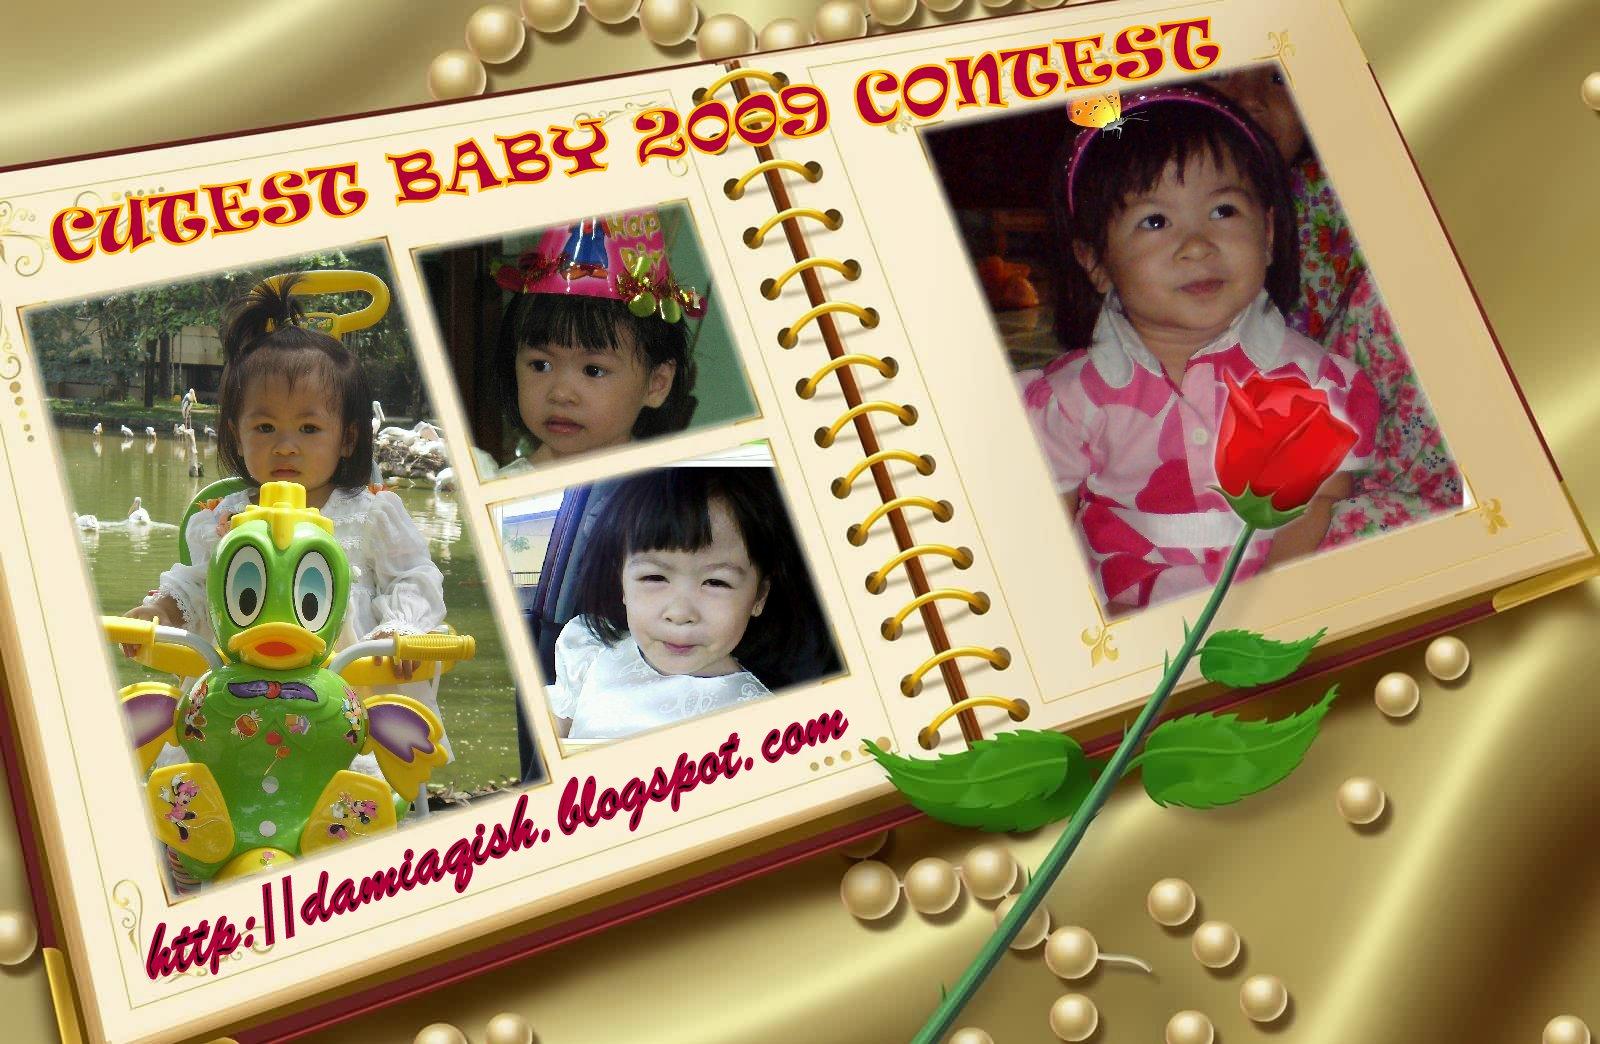 http://3.bp.blogspot.com/_dIZNPMF18pY/SwX3jh0JuLI/AAAAAAAAEHc/lS4c9u4eMGU/s1600/Cutest+Baby+2009+Contest.jpg